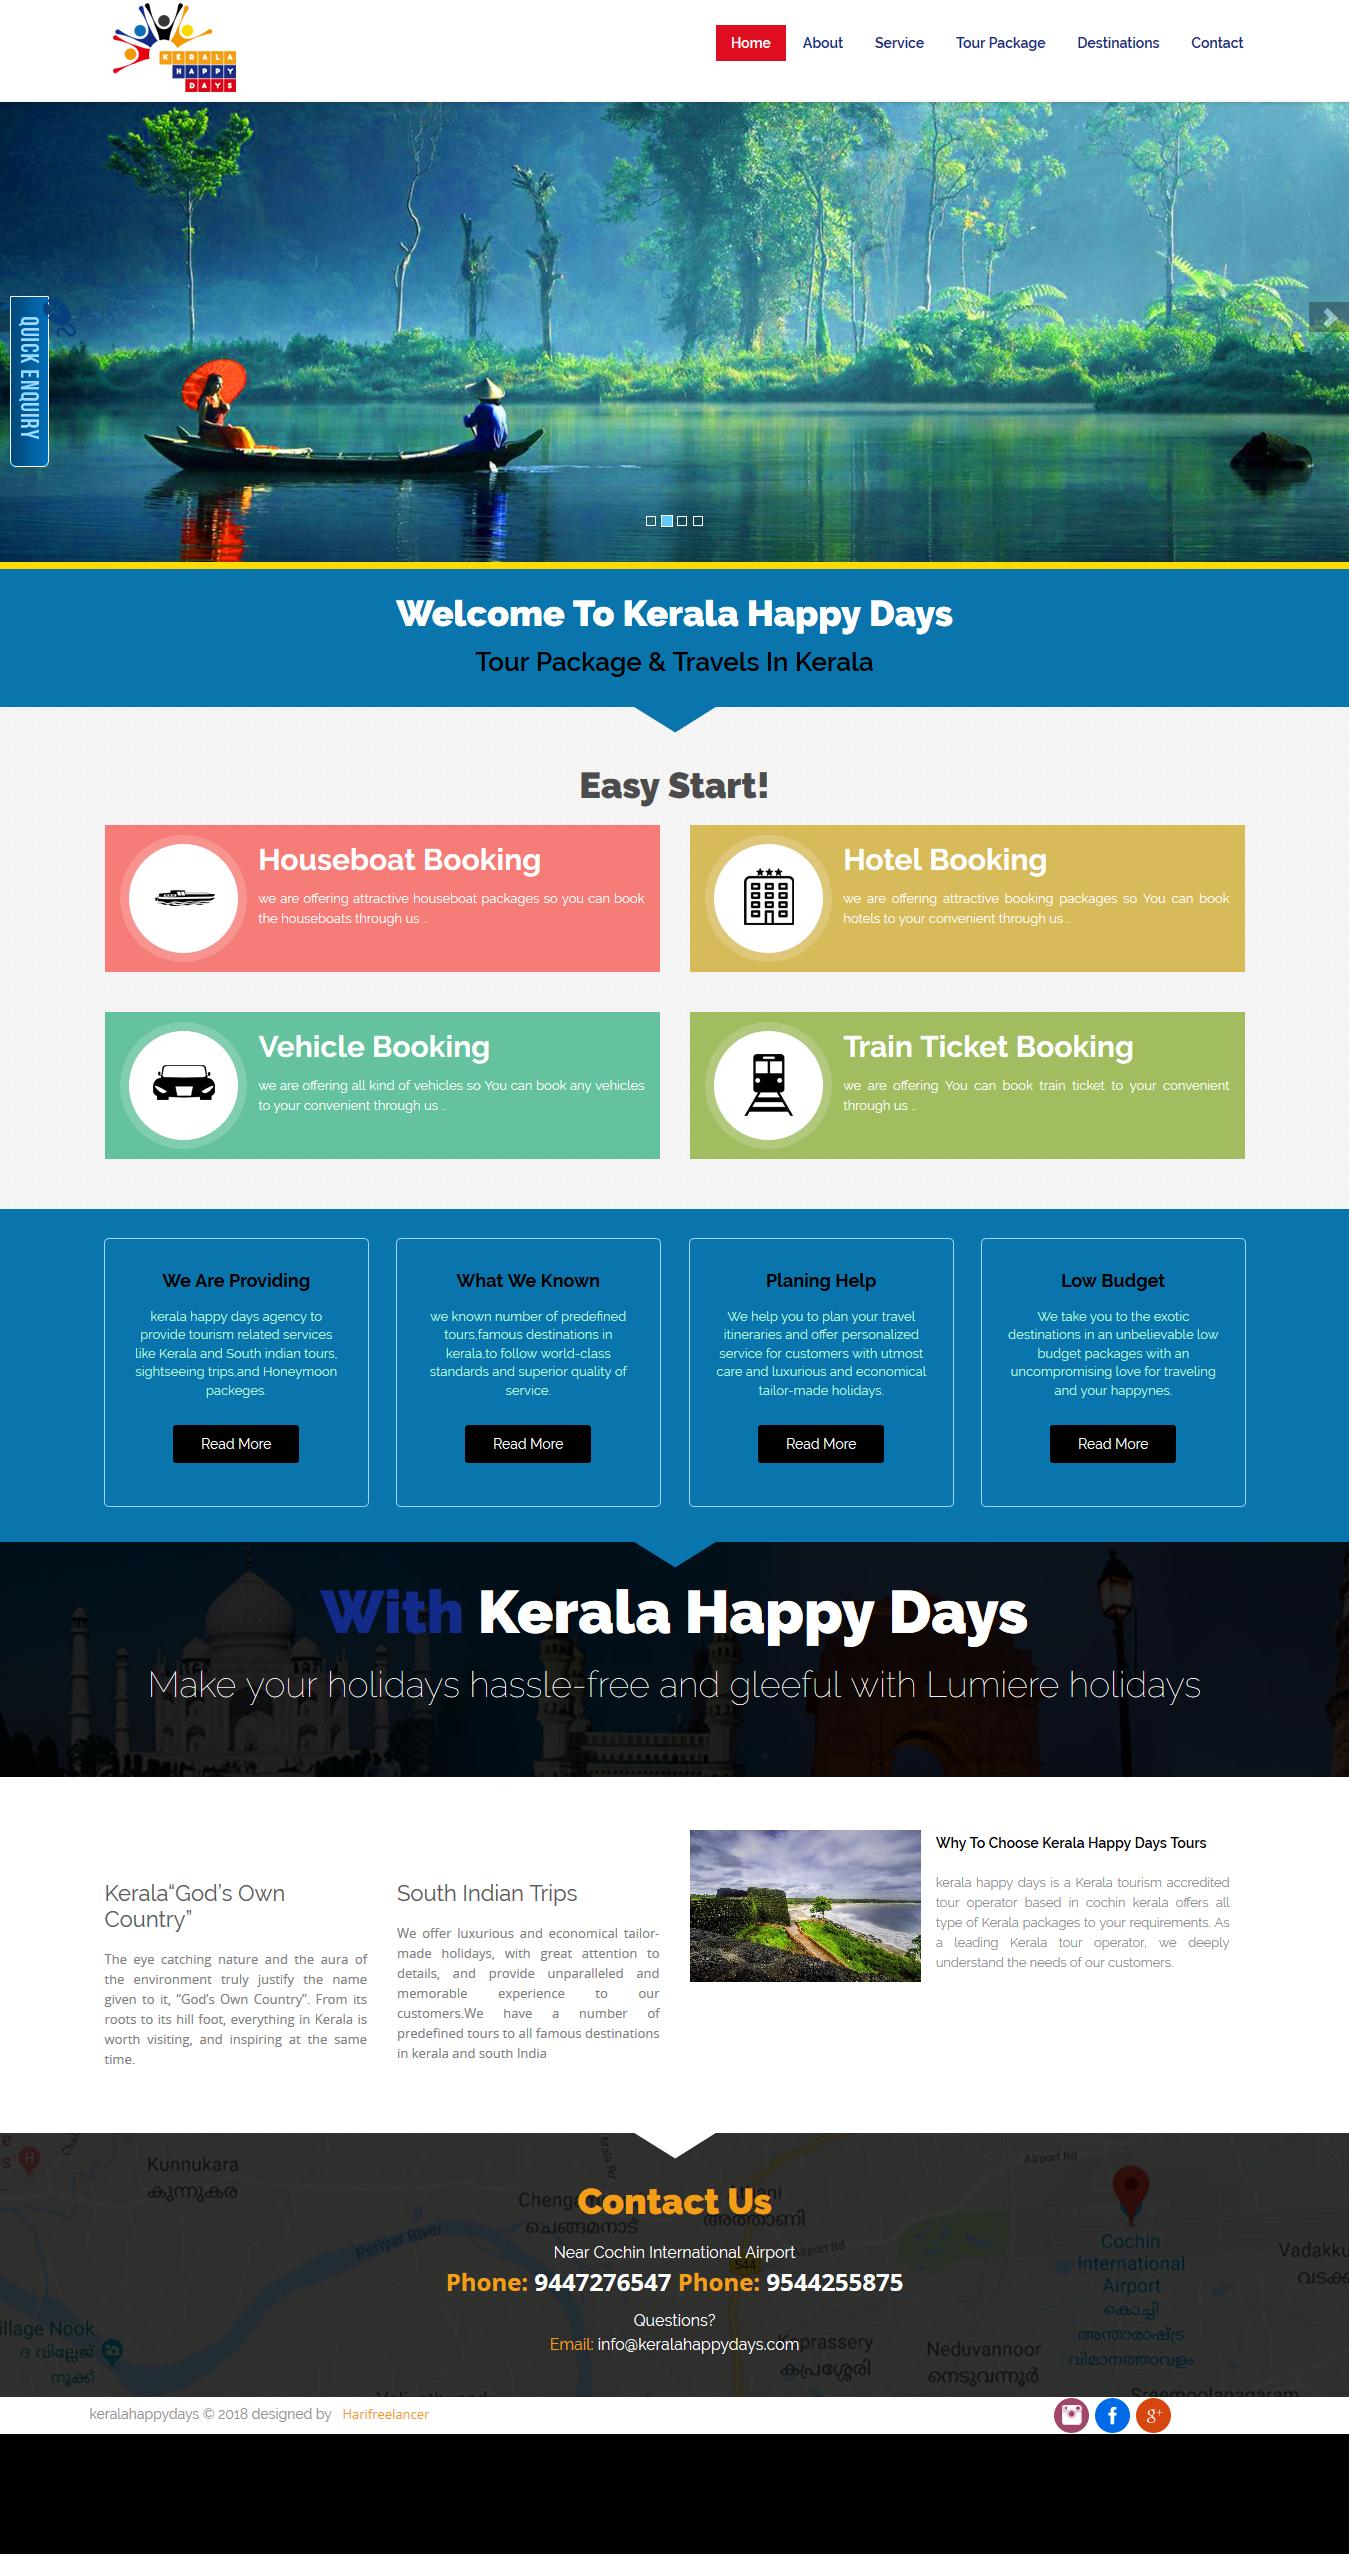 web design kottayam, web design alappuzha, web design pathanamthitta